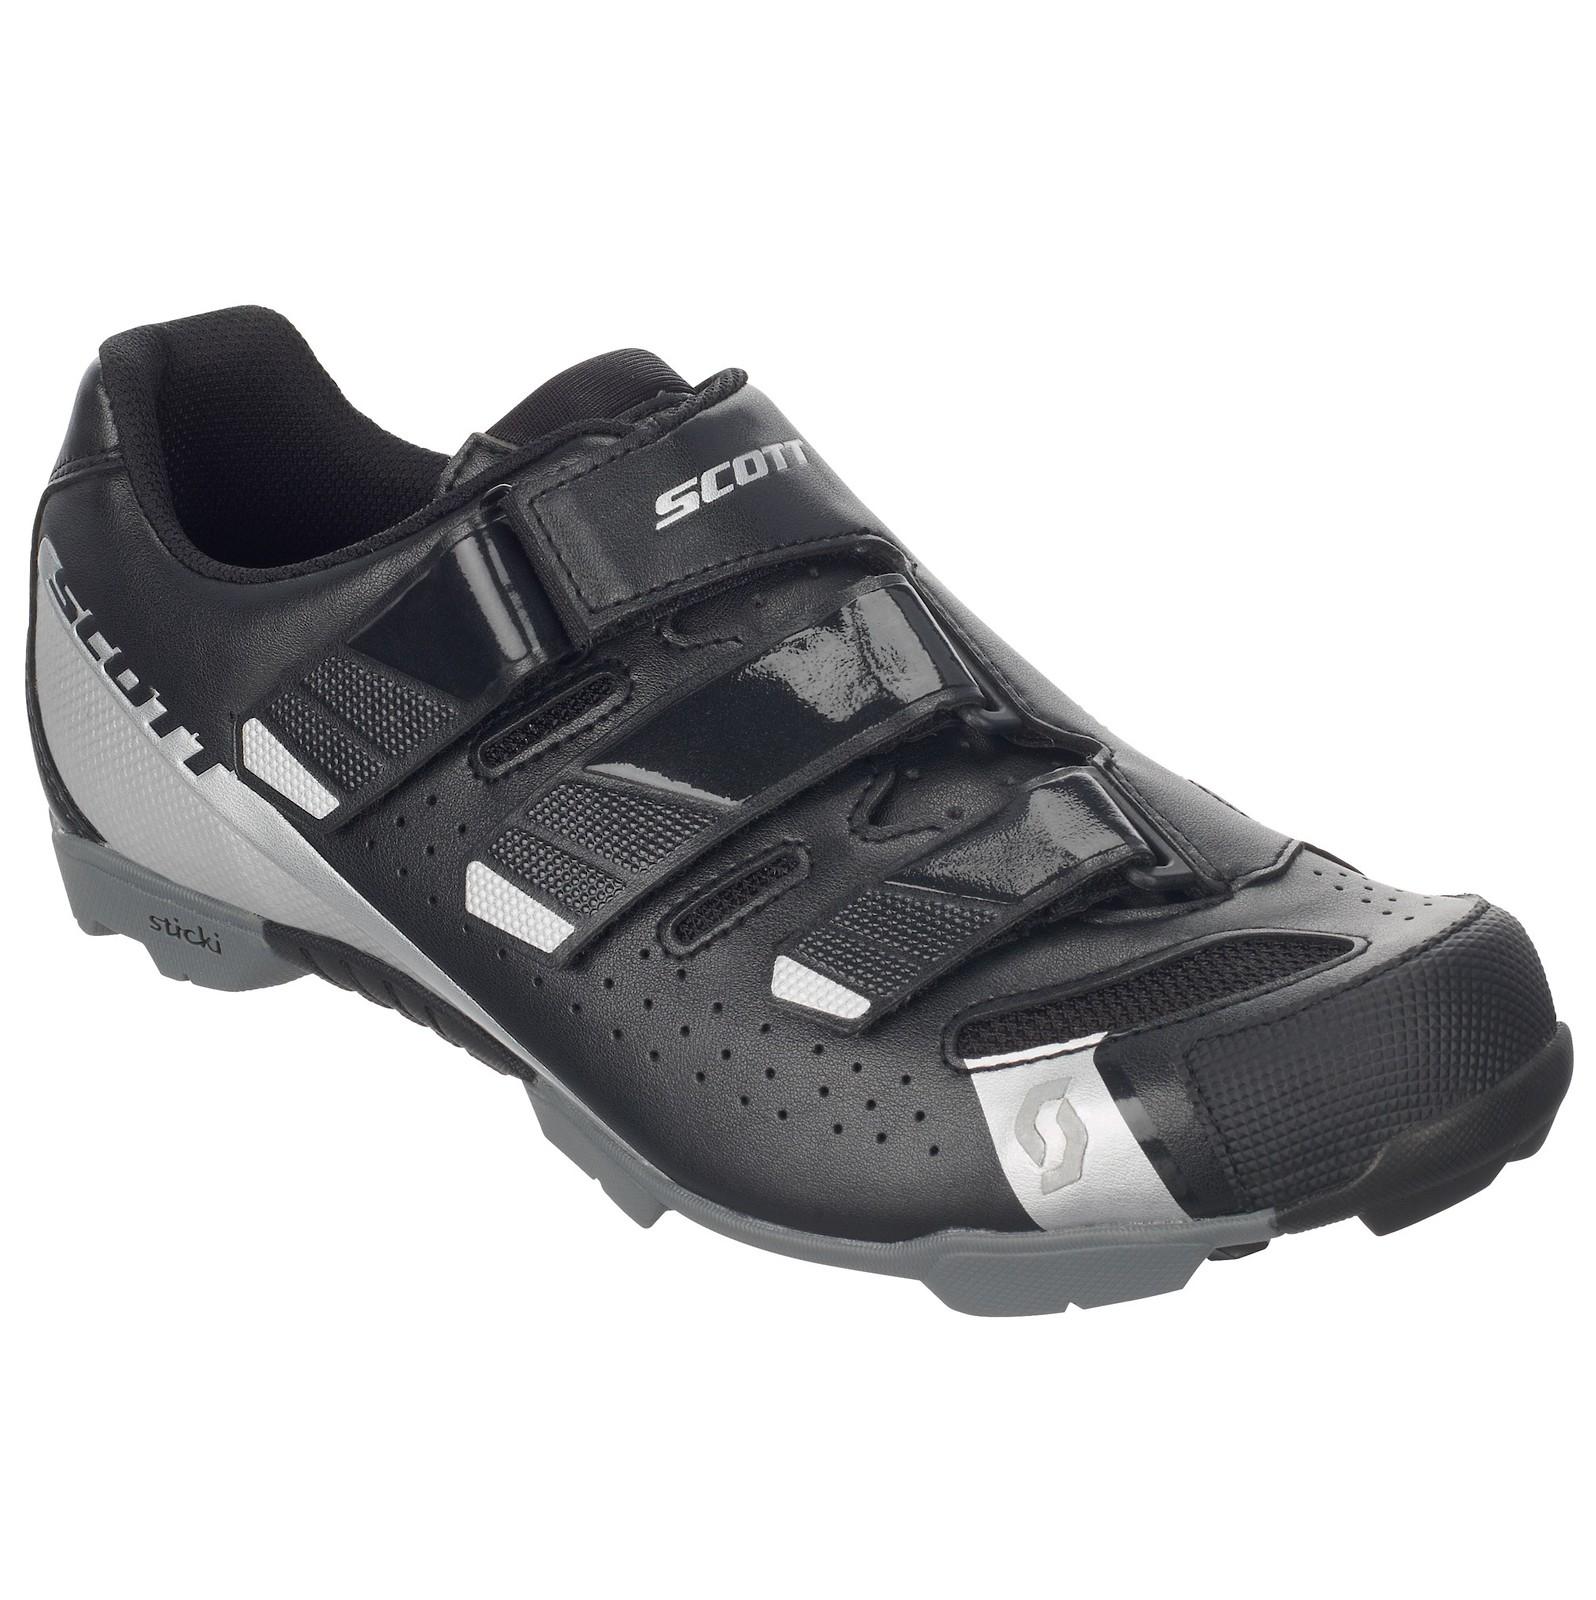 Scott Comp RS shoe in black/silver